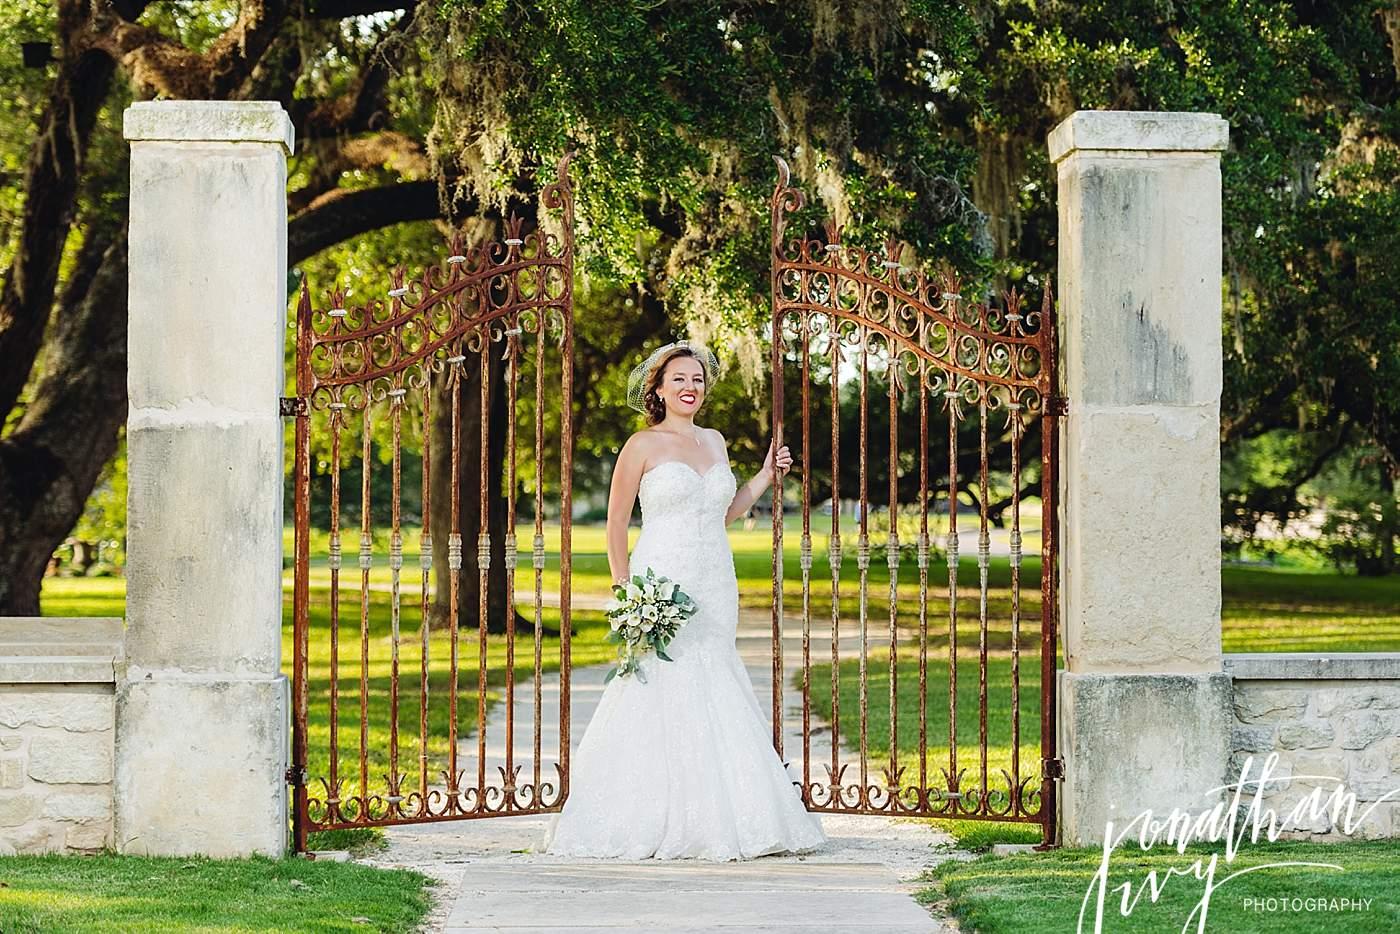 Houston Oaks Bridal,Houston Oaks Country Club,Houston Oaks Country Club Bridal,Houston Oaks Country Club Wedding,Houston Oaks Wedding,Houston Photographer,Houston Wedding Photographer,The Woodlands Photographer,The Woodlands Wedding Photographer,